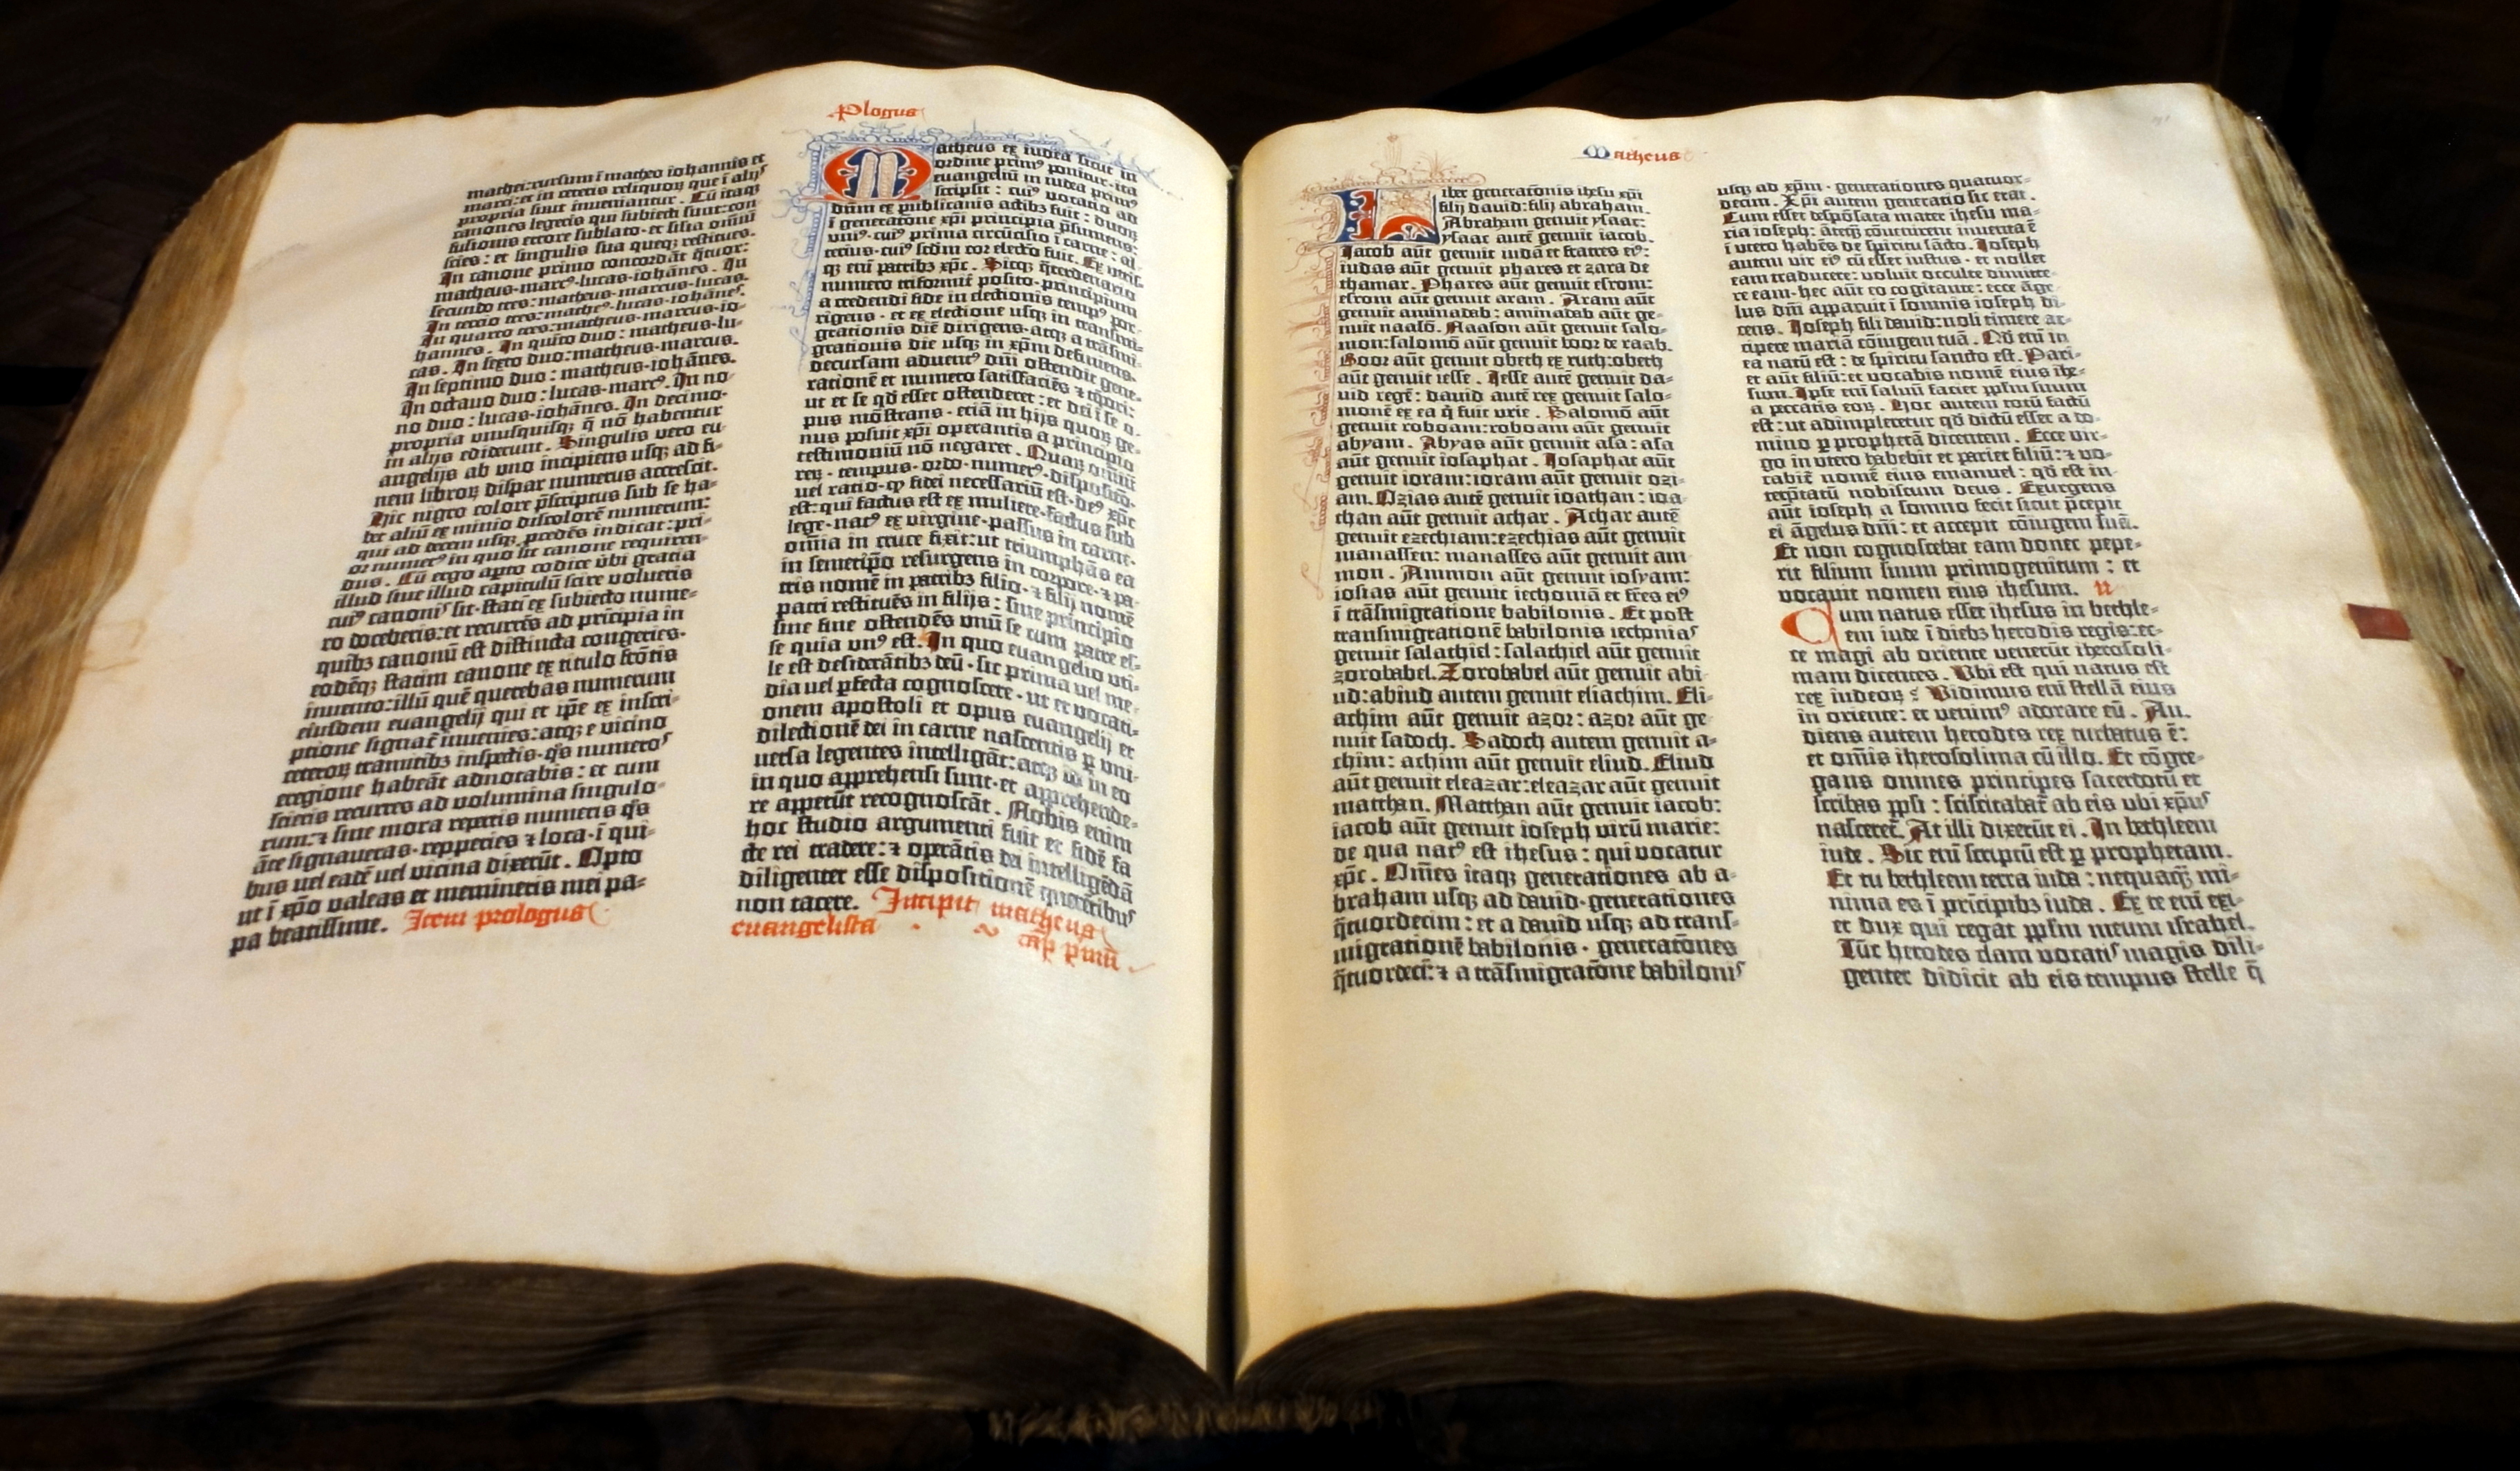 Gutenberg_Bible_(Pelplin_copy)_02